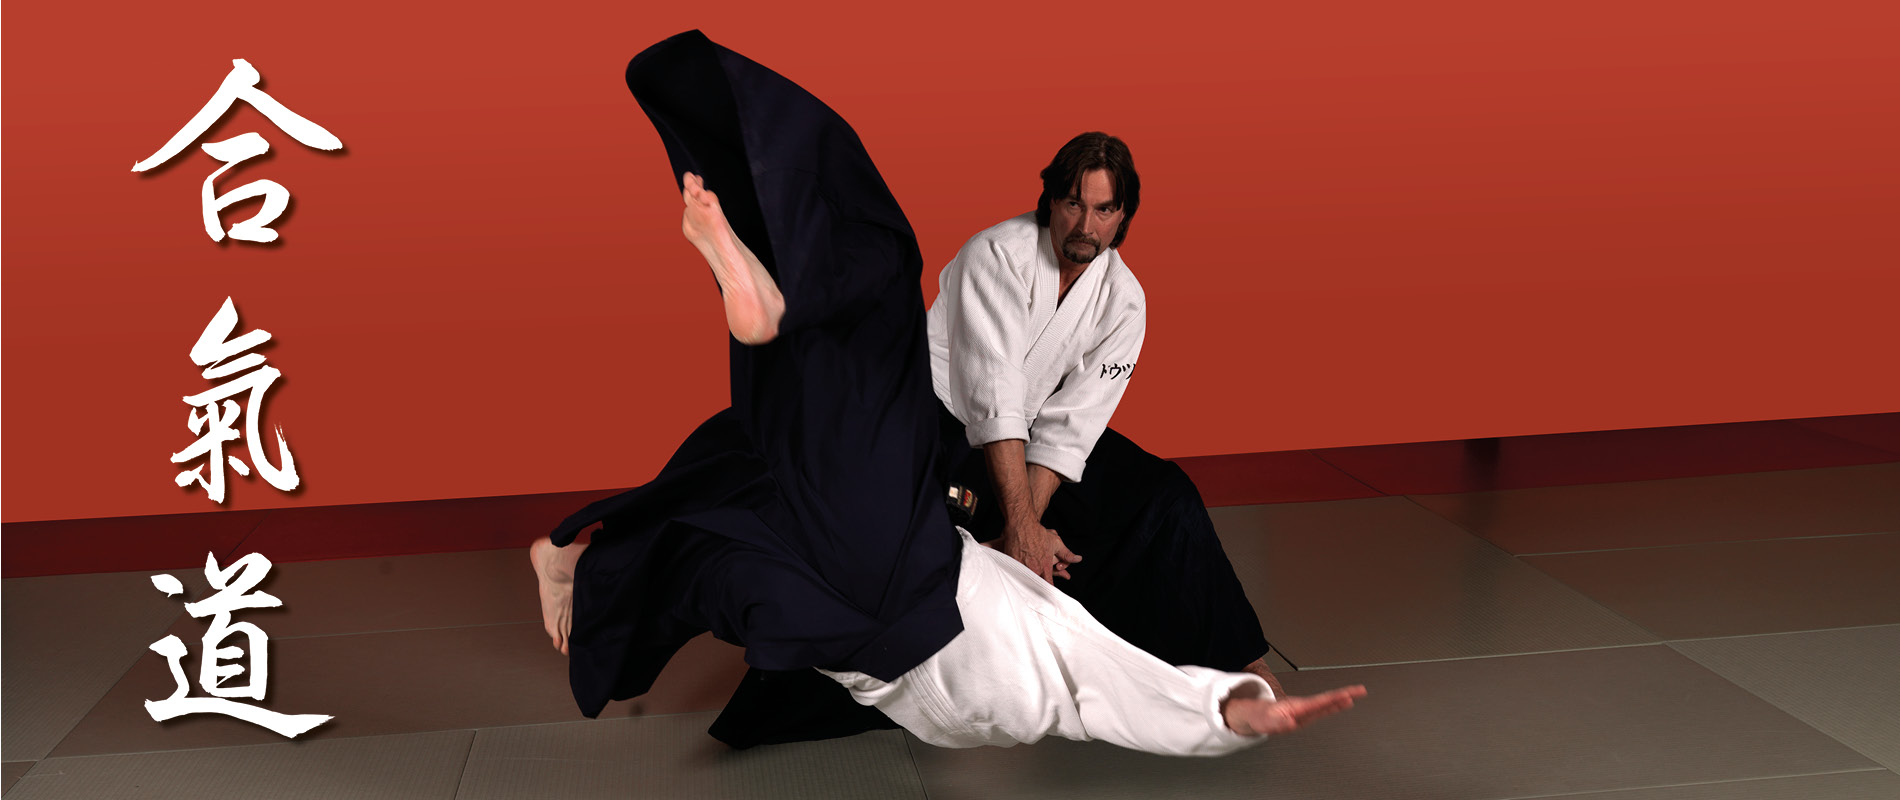 Aikido header afbeelding v4 3